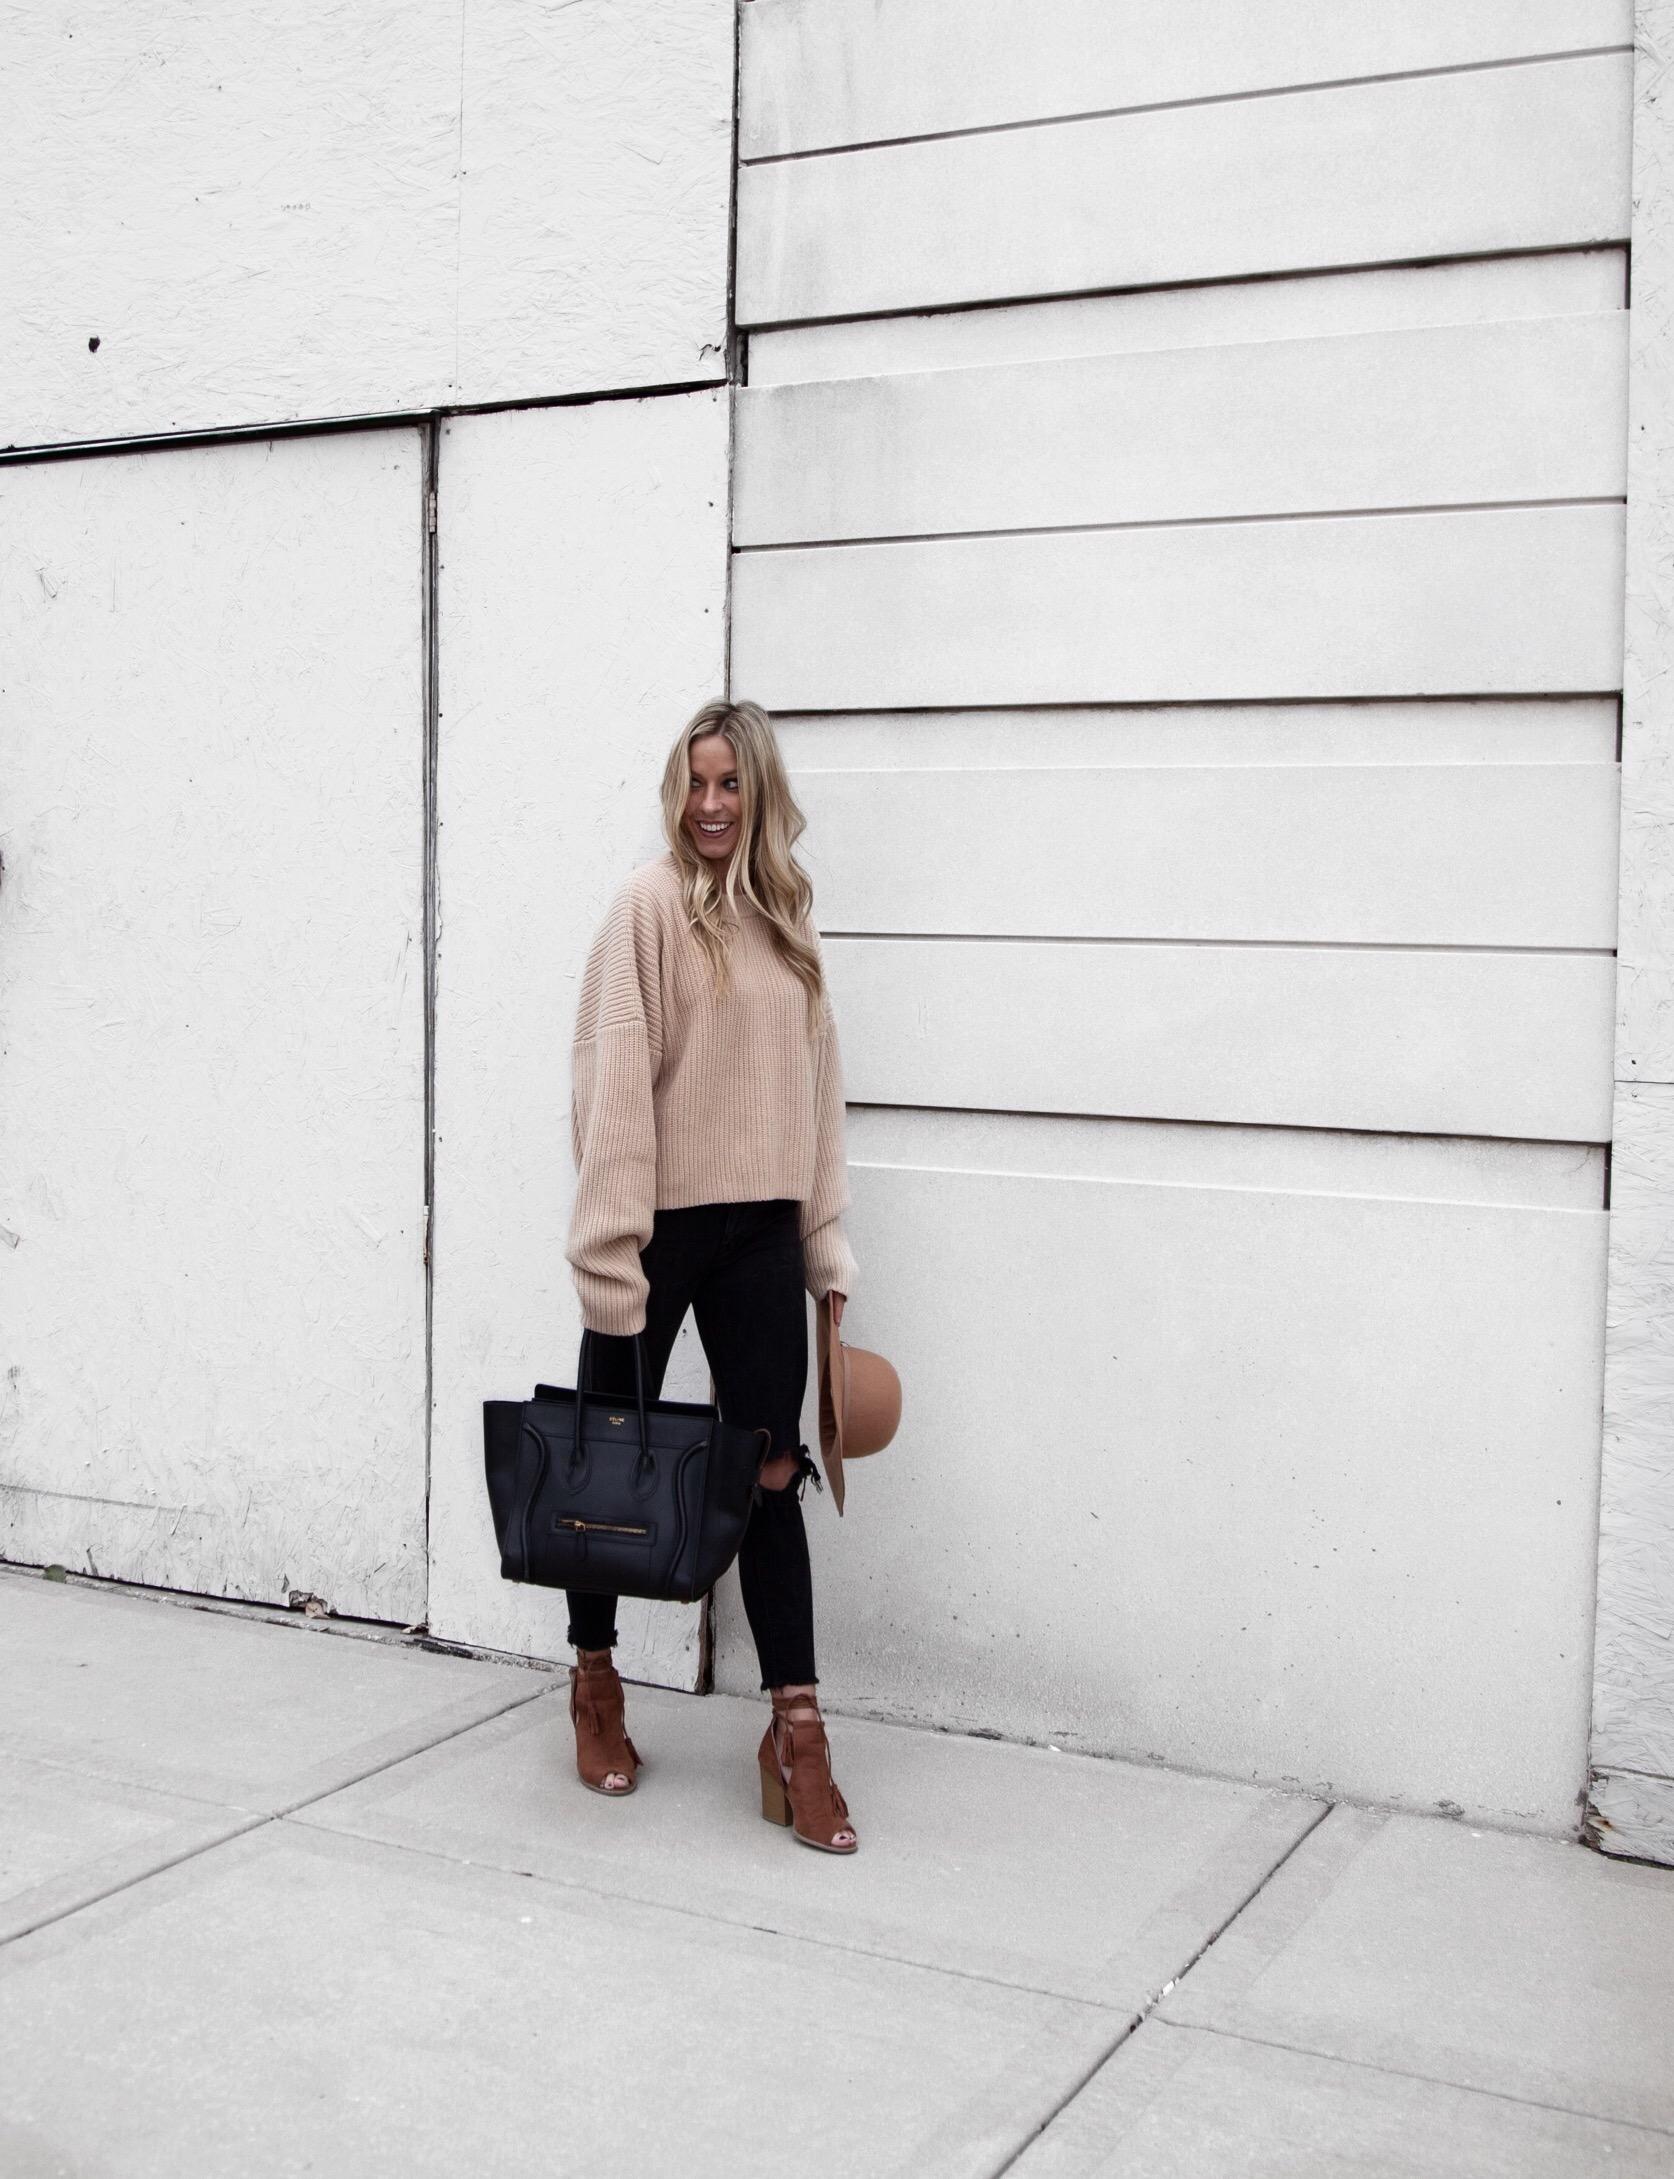 Beige Sweater + Distressed Denim